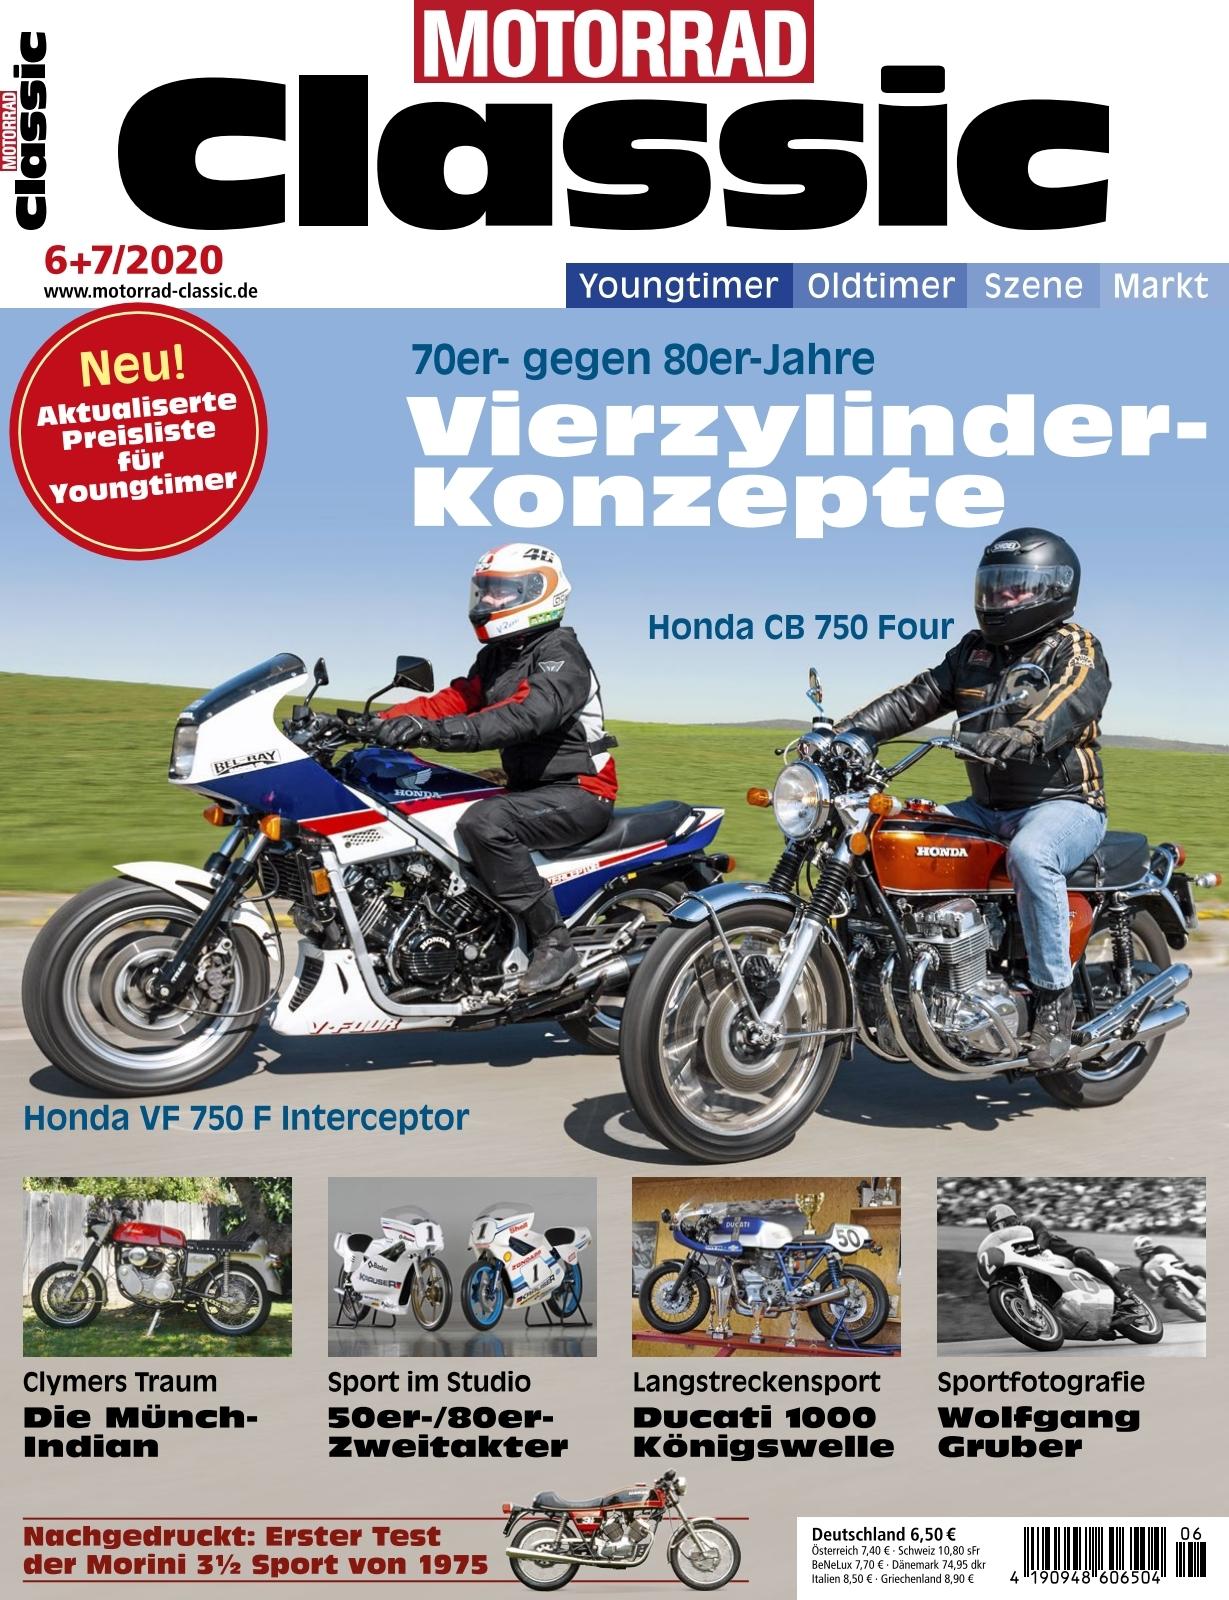 Kawasaki 750H2 Blinker Baugleich Herkunft